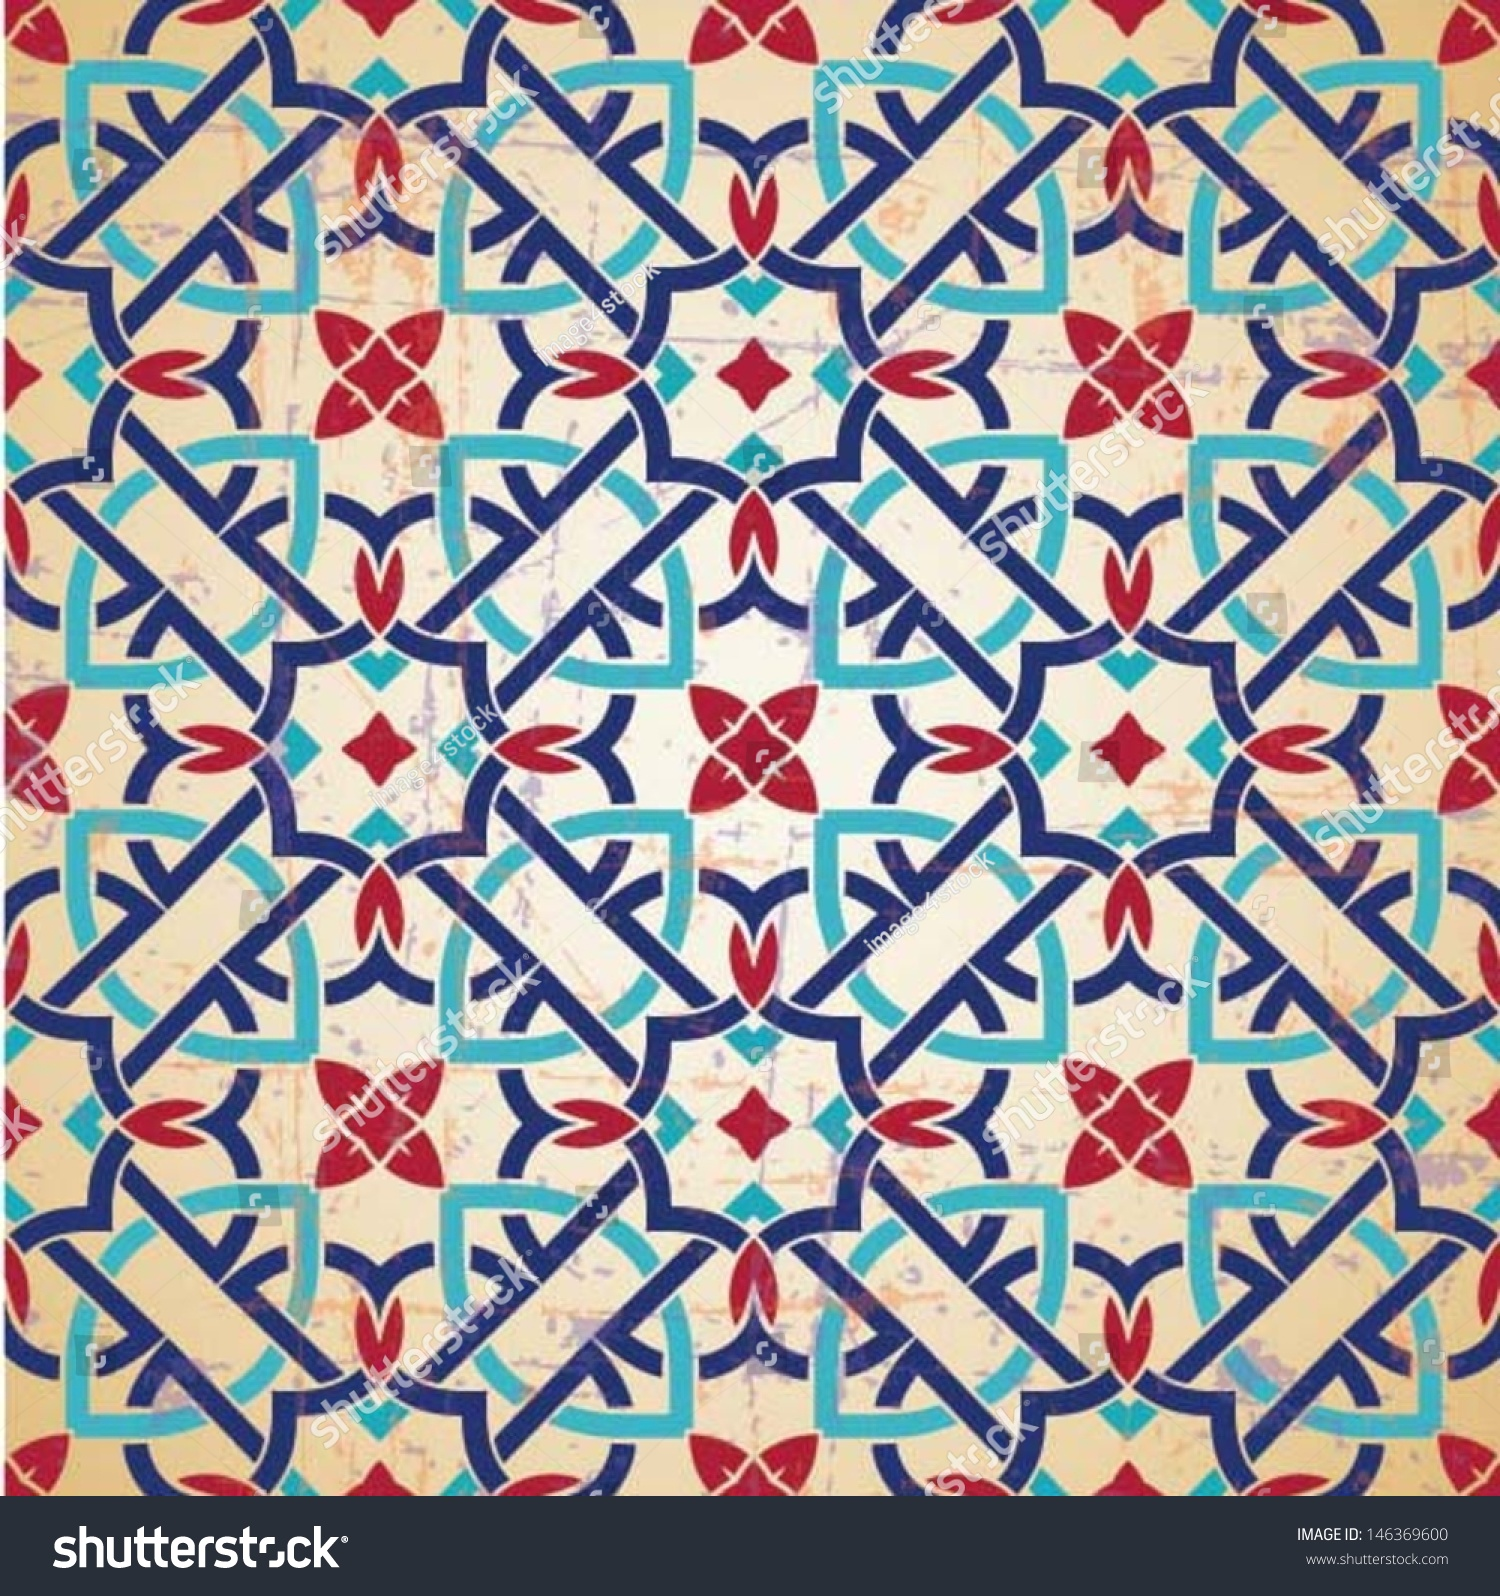 ... ornament, Moroccan seamless pattern, tile design, vector illustration